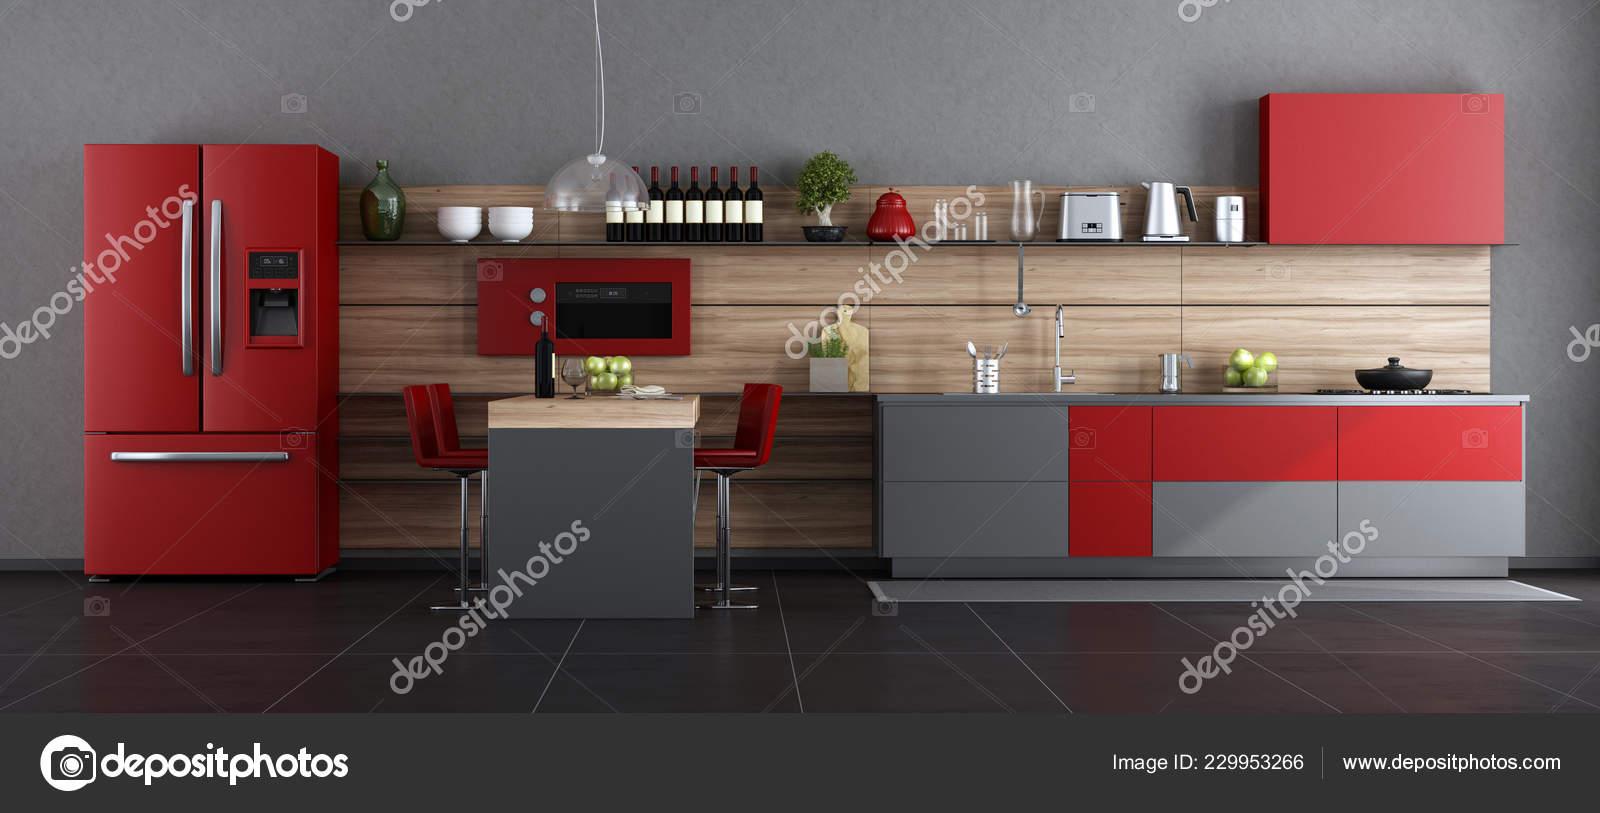 Rosso grigio cucina moderna con isola sgabello bar rendering